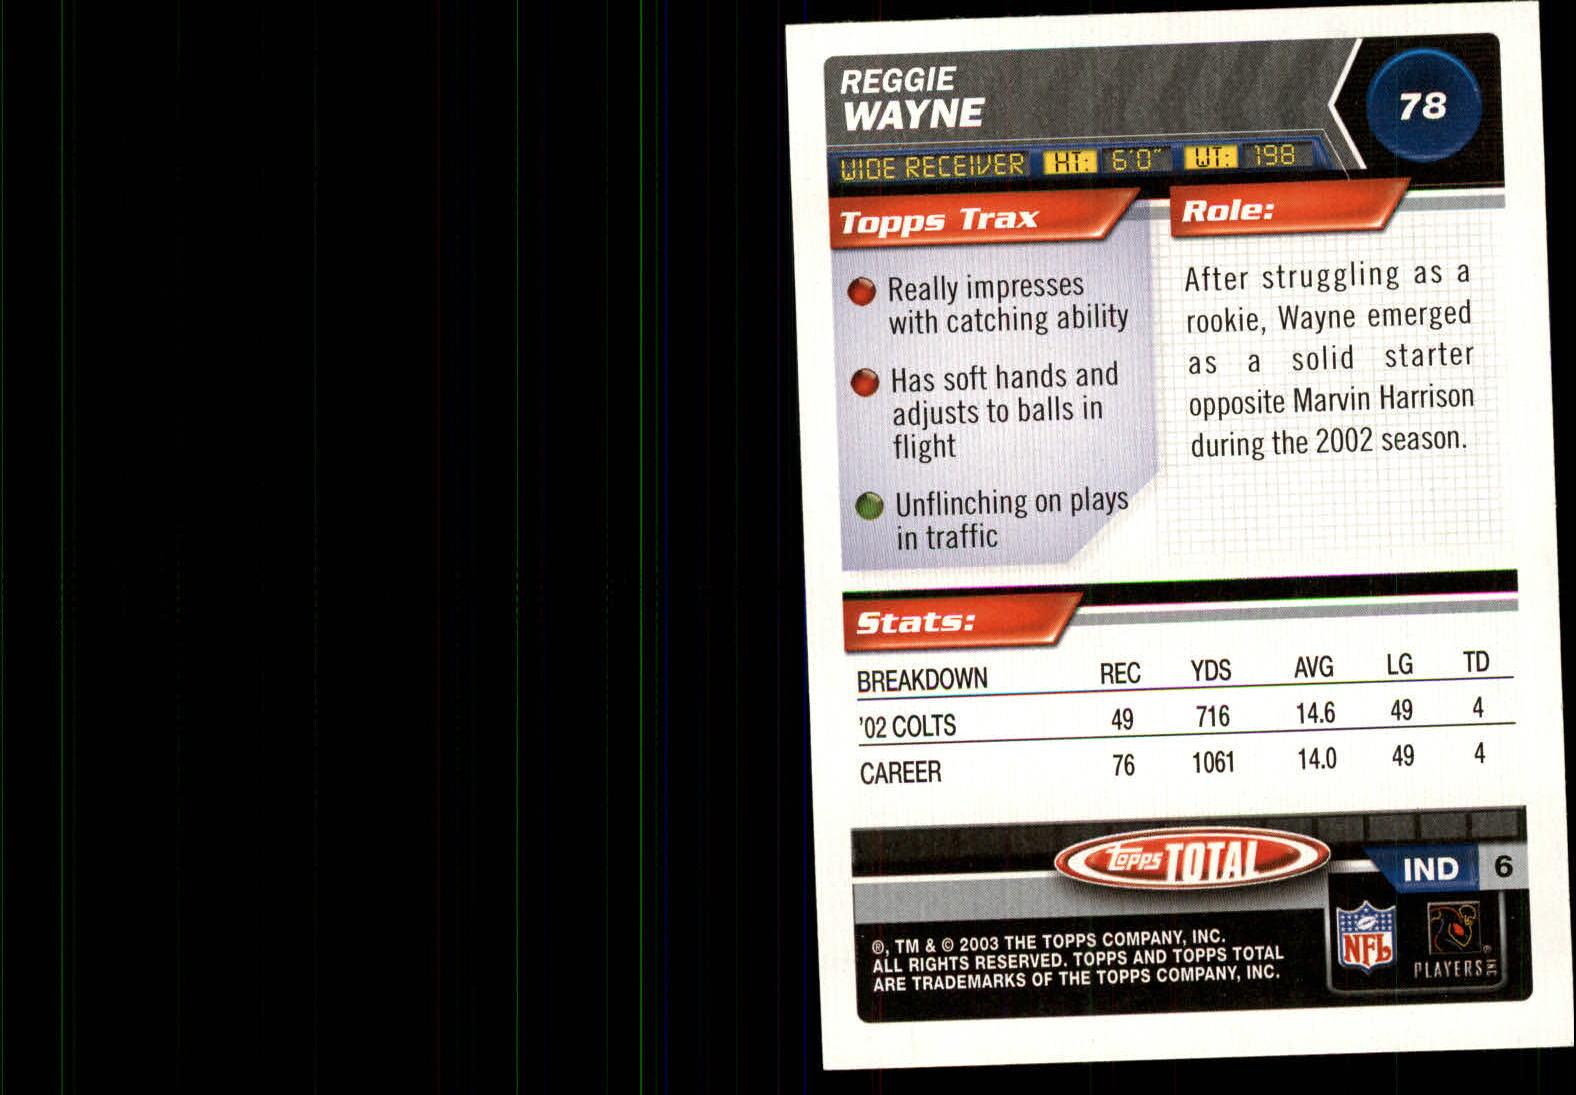 2003 Topps Total Silver #78 Reggie Wayne back image